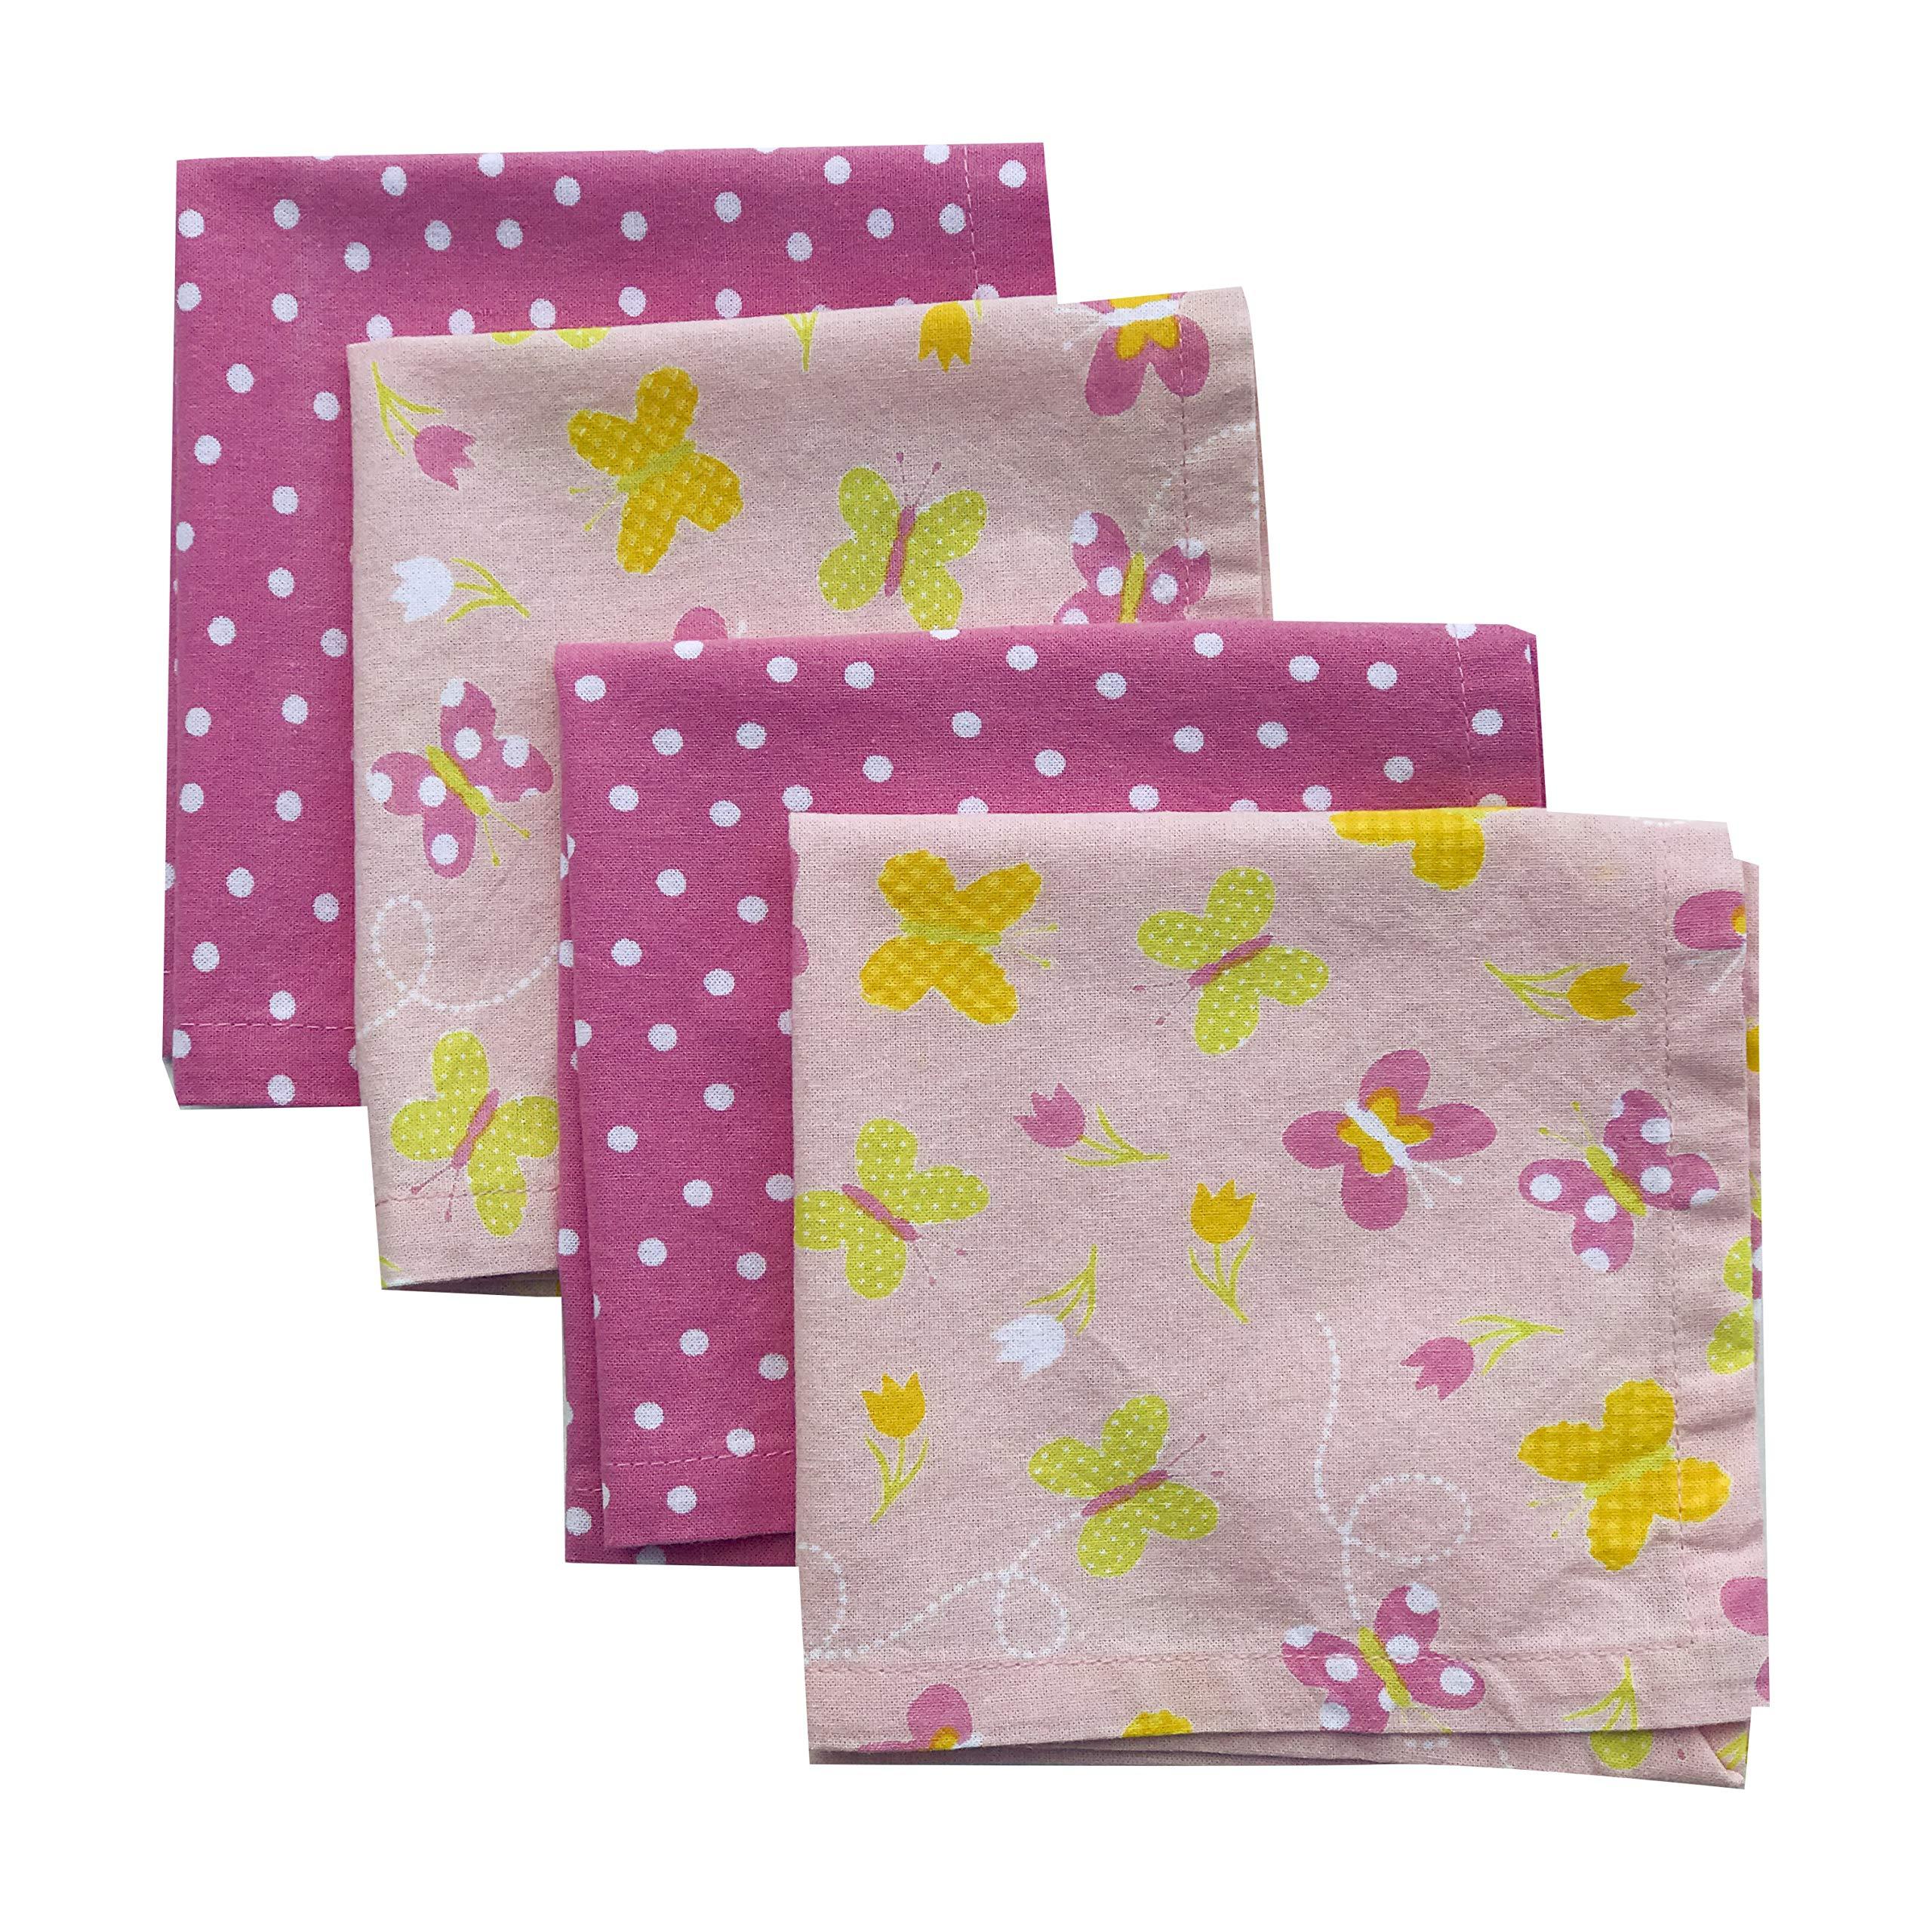 Funkins Reusable Cloth Napkins for Kids | Name Tag | 12''x12'' Soft Cotton Napkins, Set of 4 | Butterflies